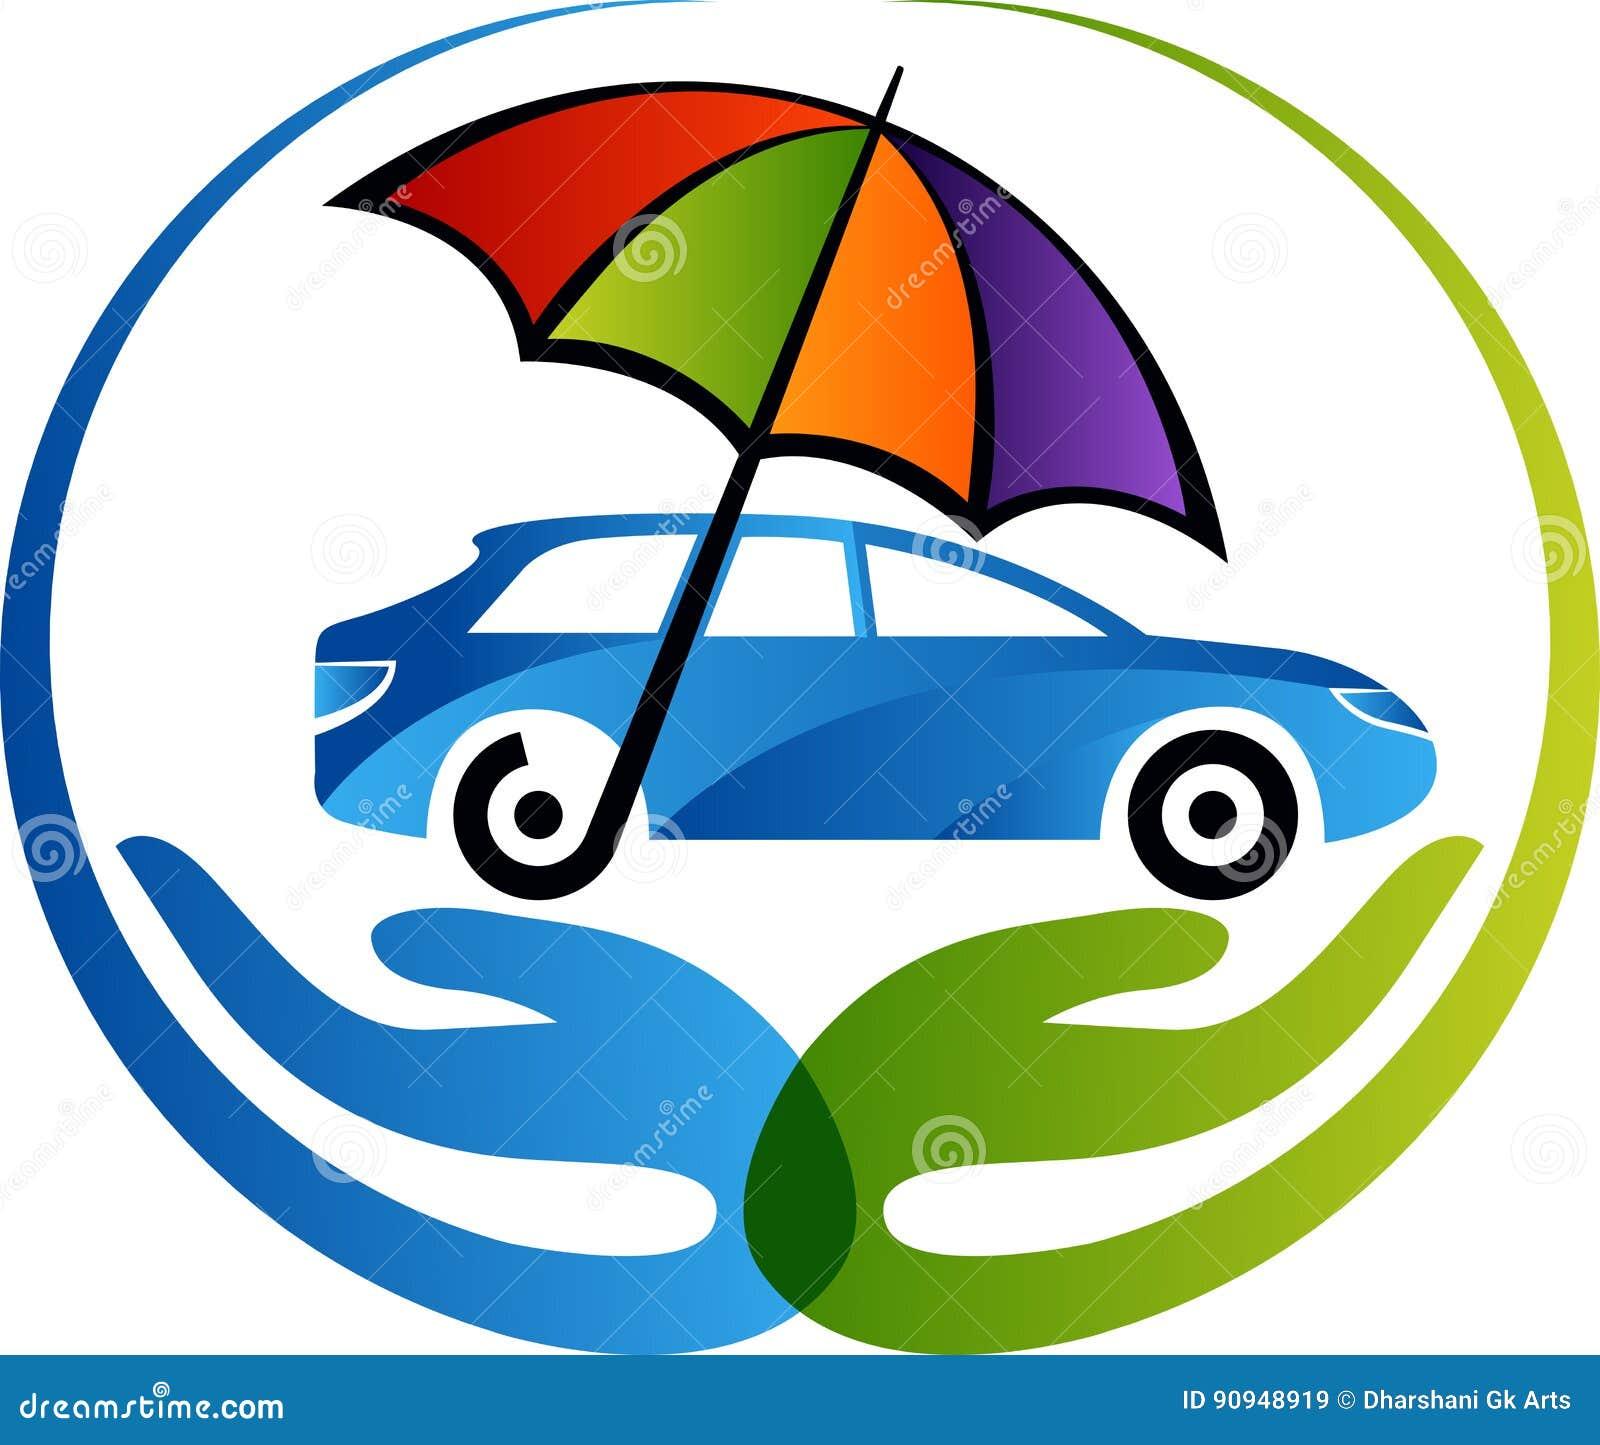 Car insurance logo stock vector. Illustration of hand ...